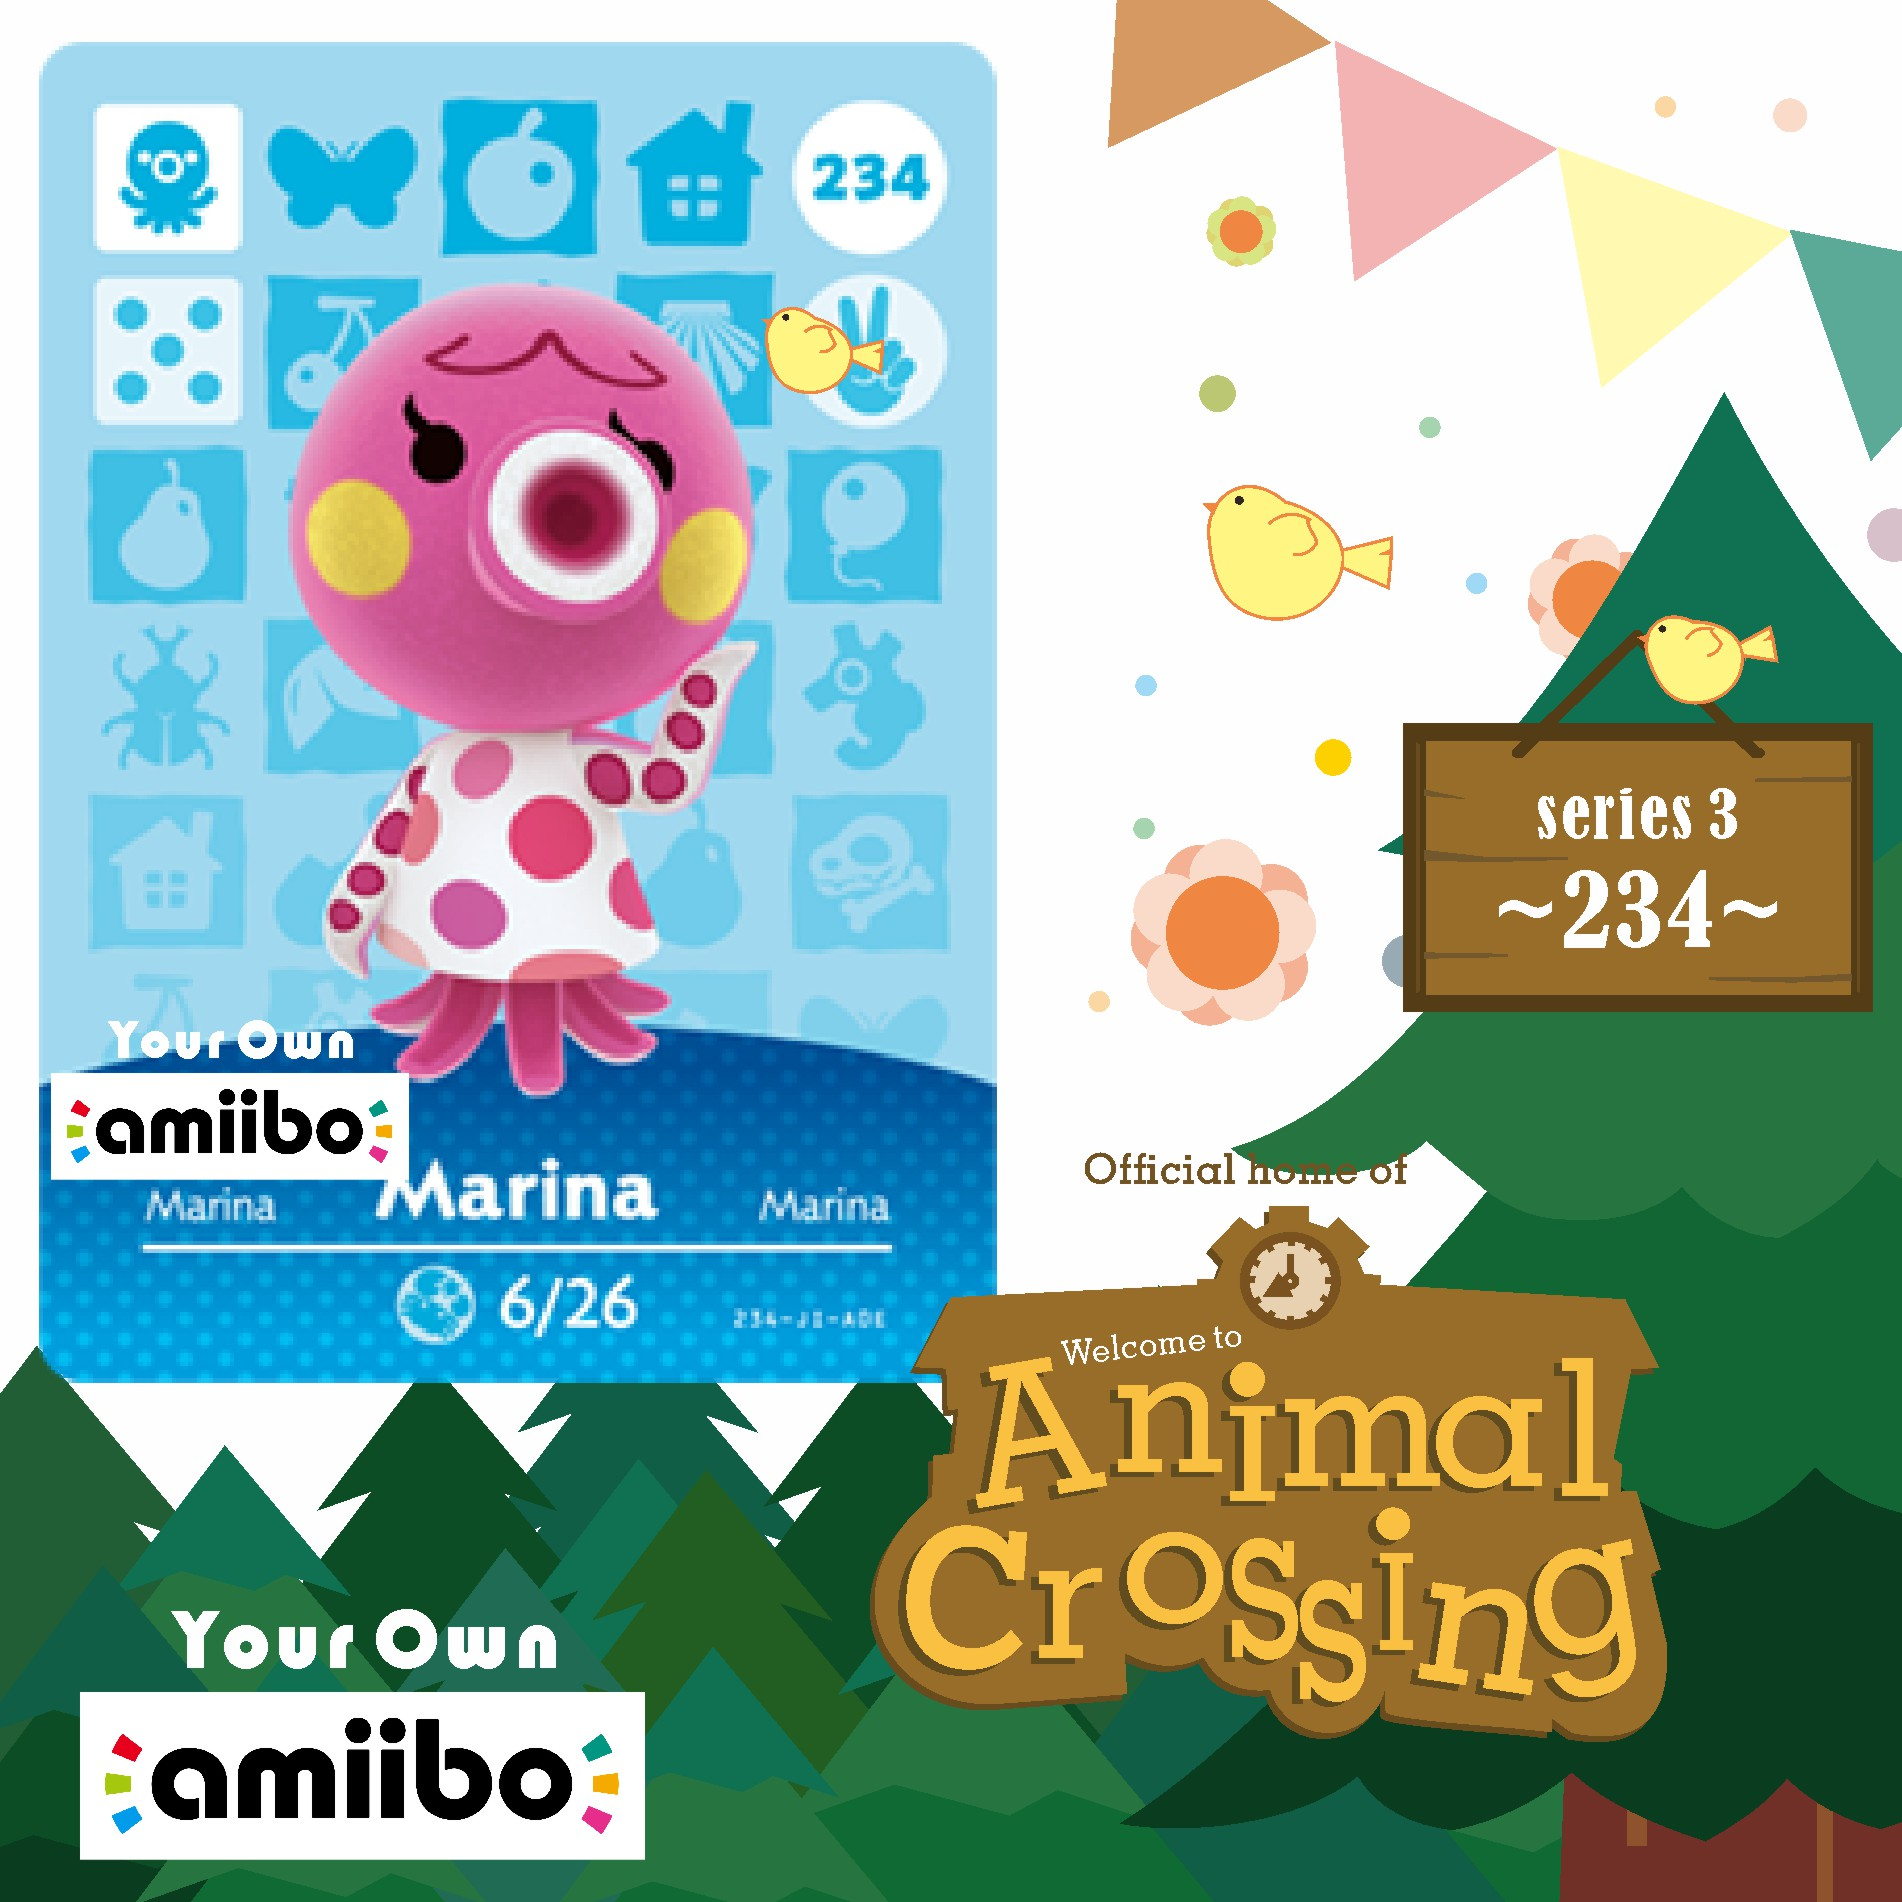 Amiibo 234 Animal Crossing Octopus Animal Crossing Amiibo Card Marina Welcome Amiibo New Horizon Villager Card 234 Series 3